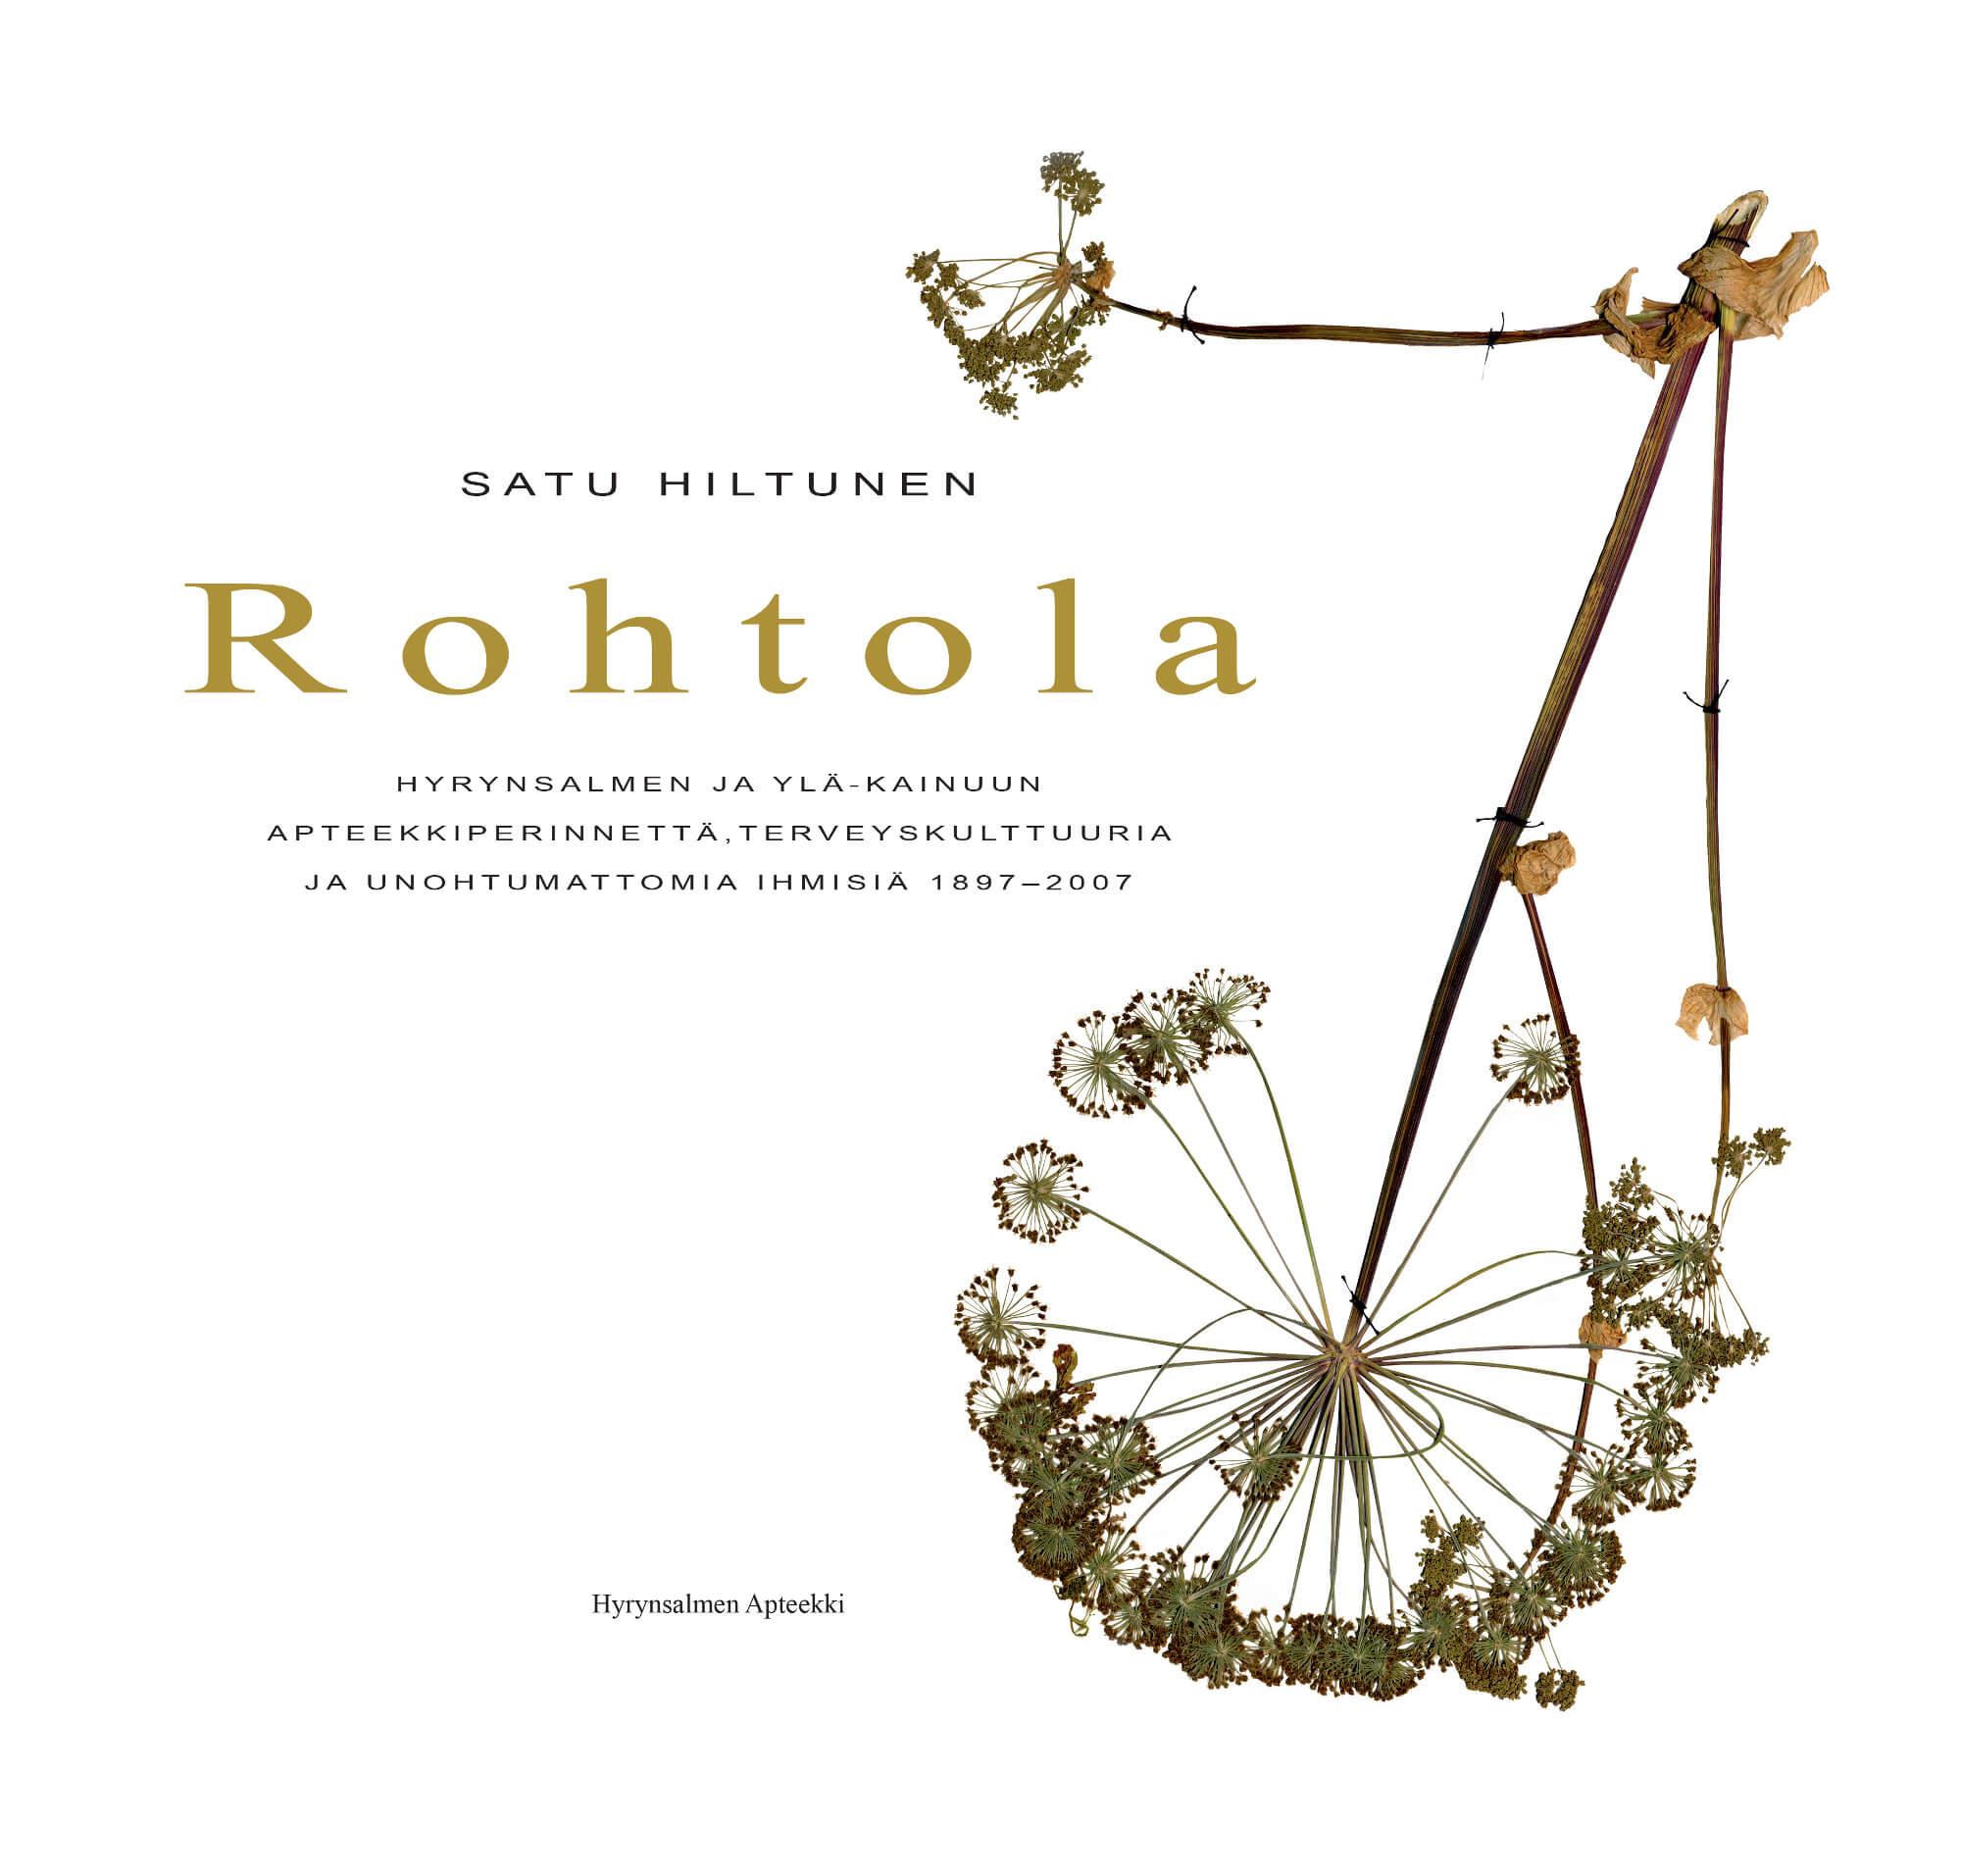 Rohtola